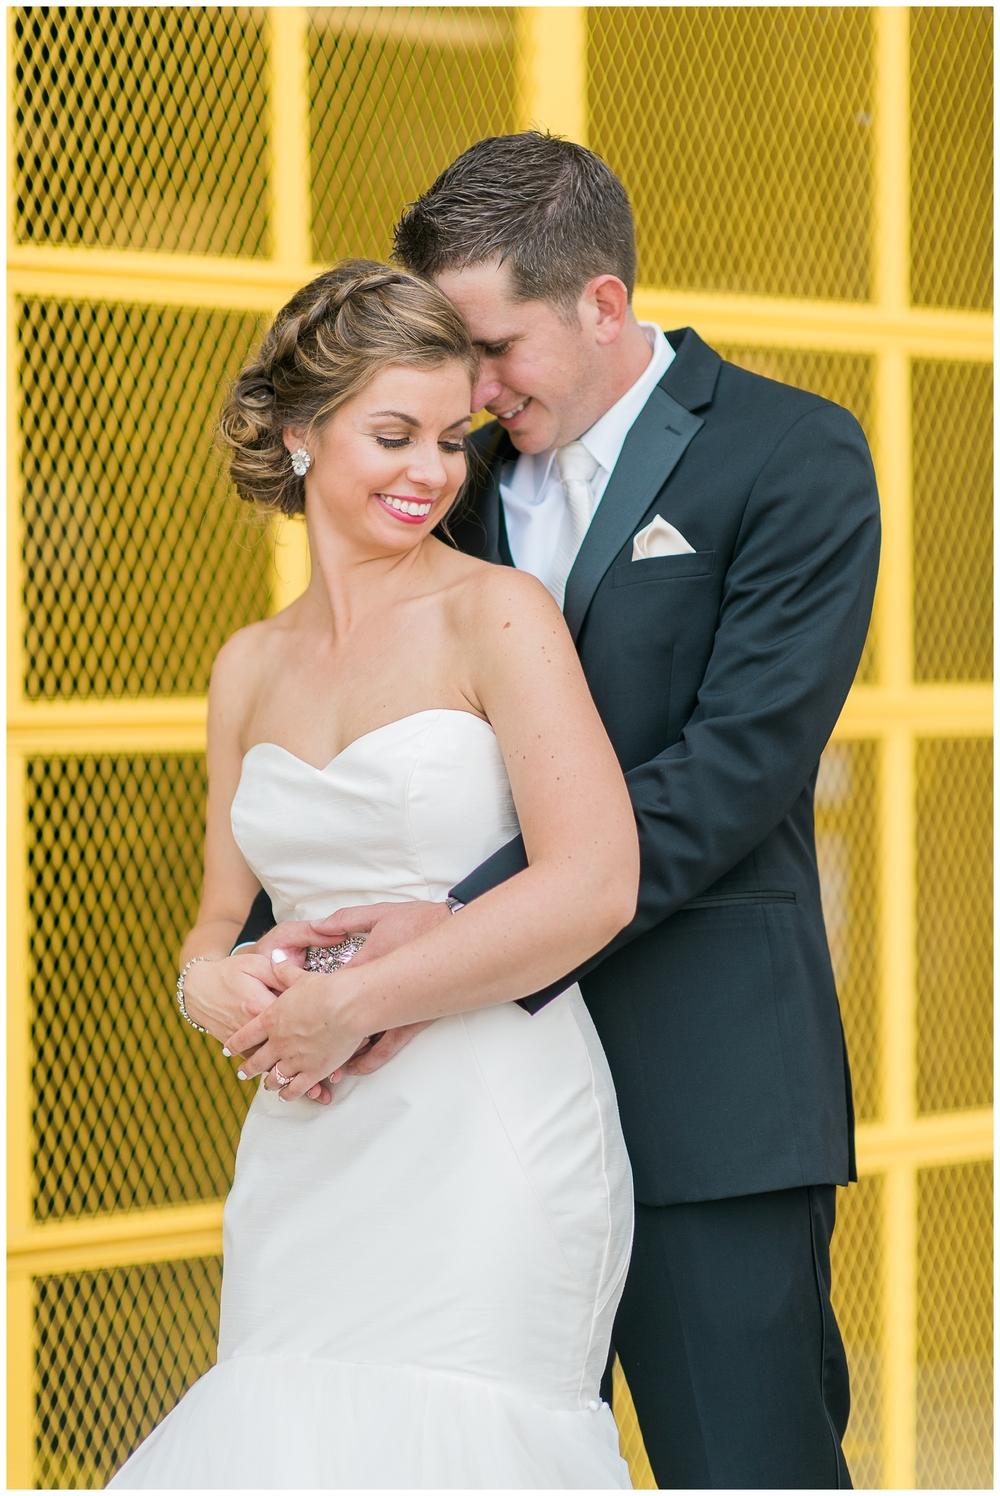 Rebecca_Bridges_Photography_Indianapolis_Wedding_Photographer_5041.jpg